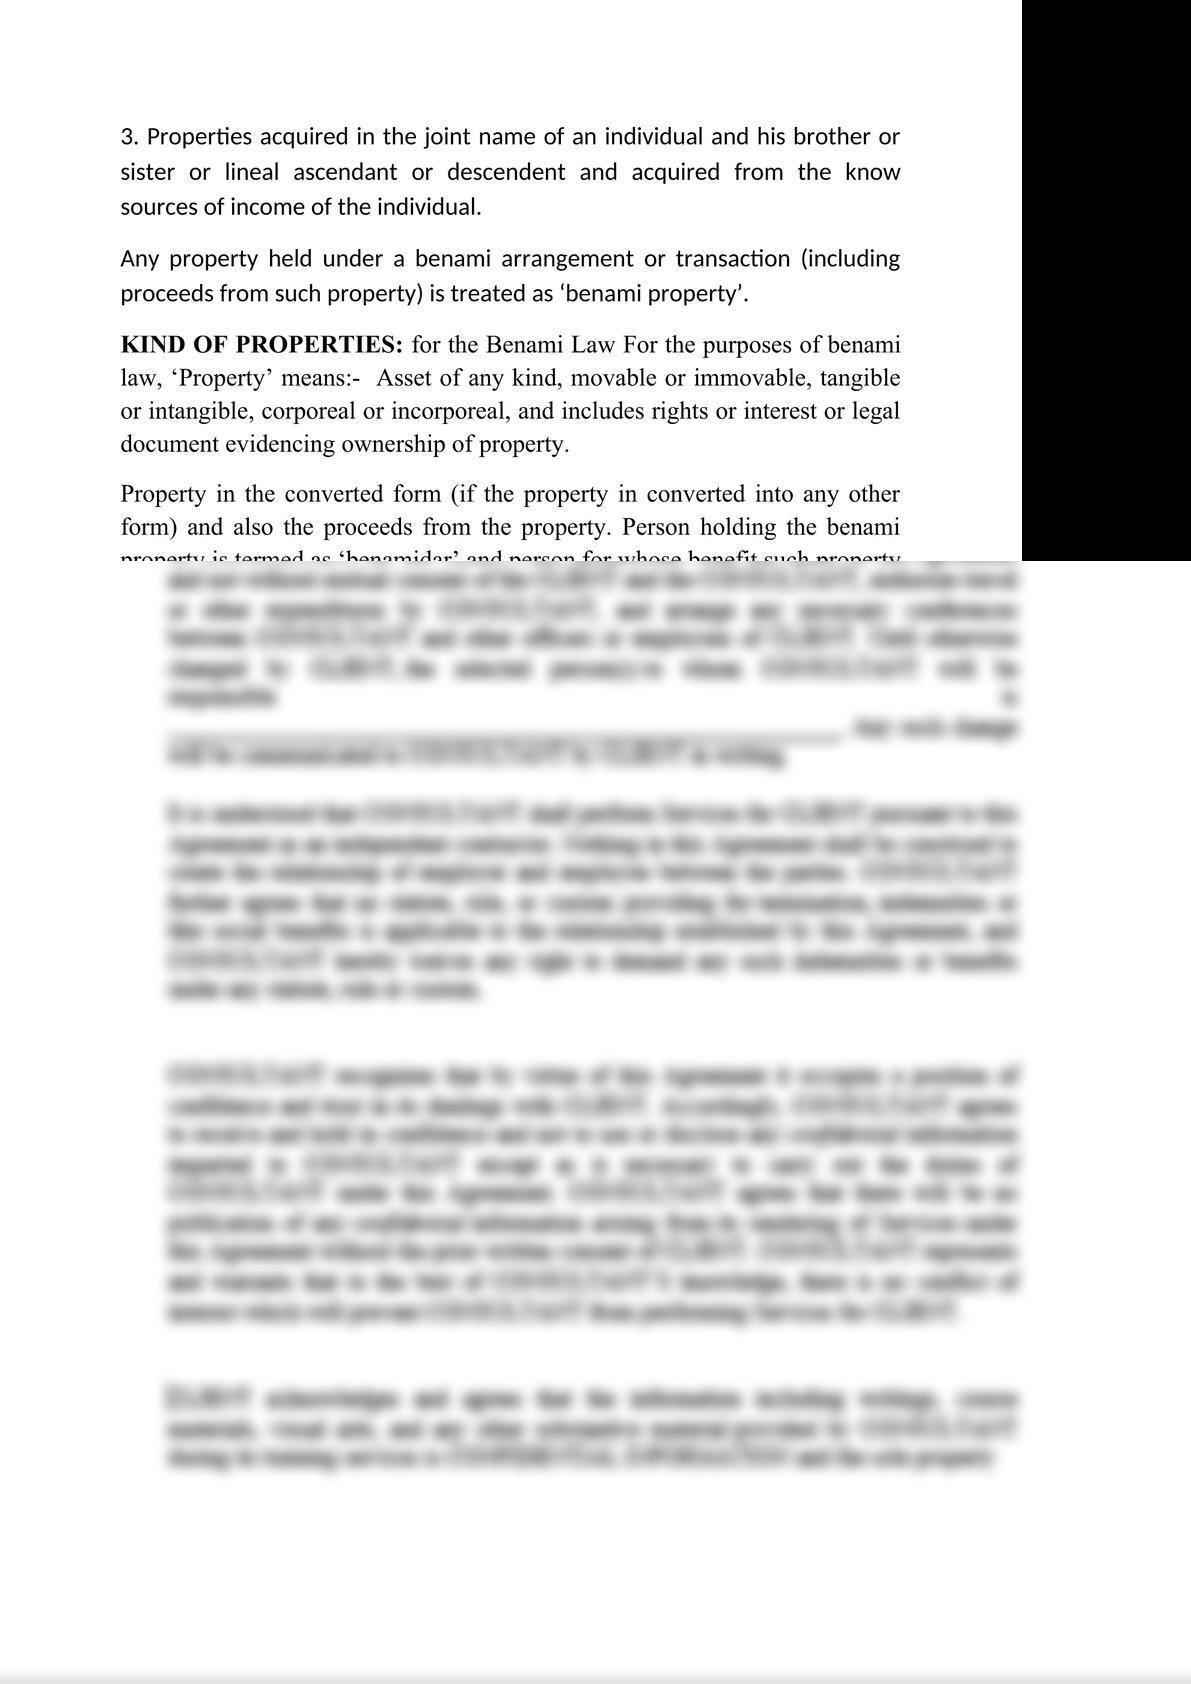 NOTES ON BENAMI TRANSACTIONS (PROHIBITION) ACT, 2017-2